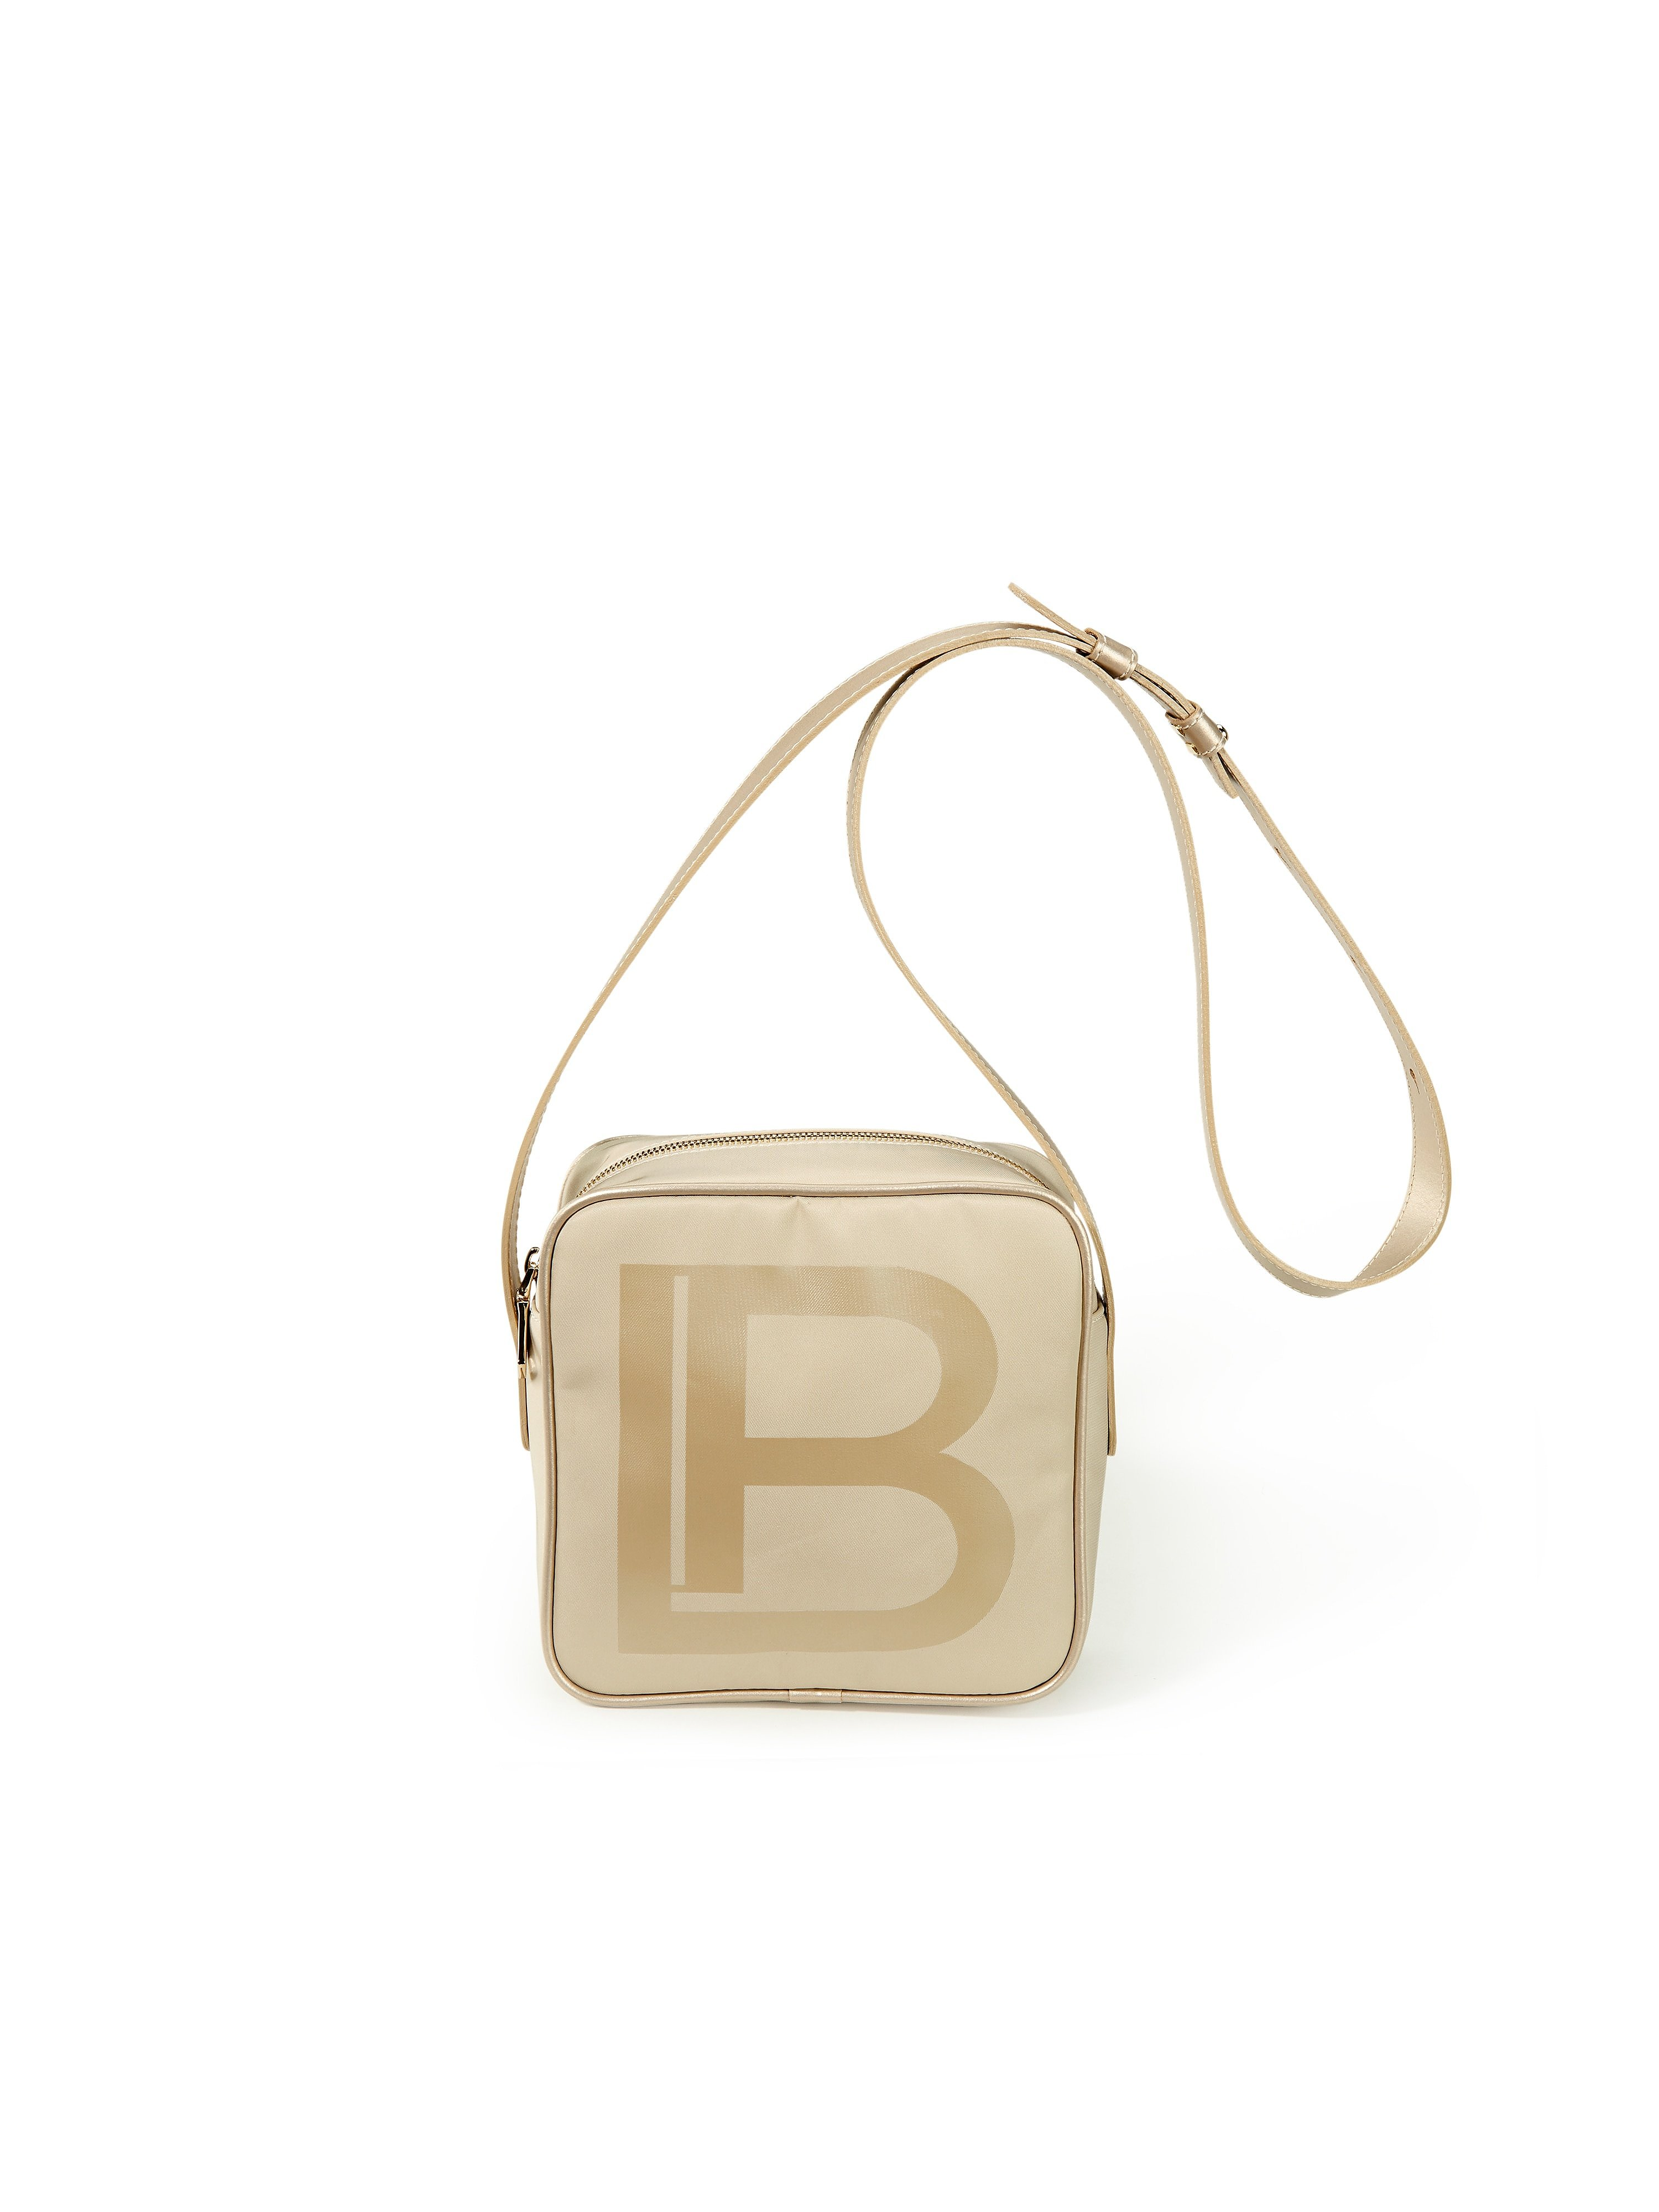 Tas logoprint Van Laura Biagiotti ROMA beige